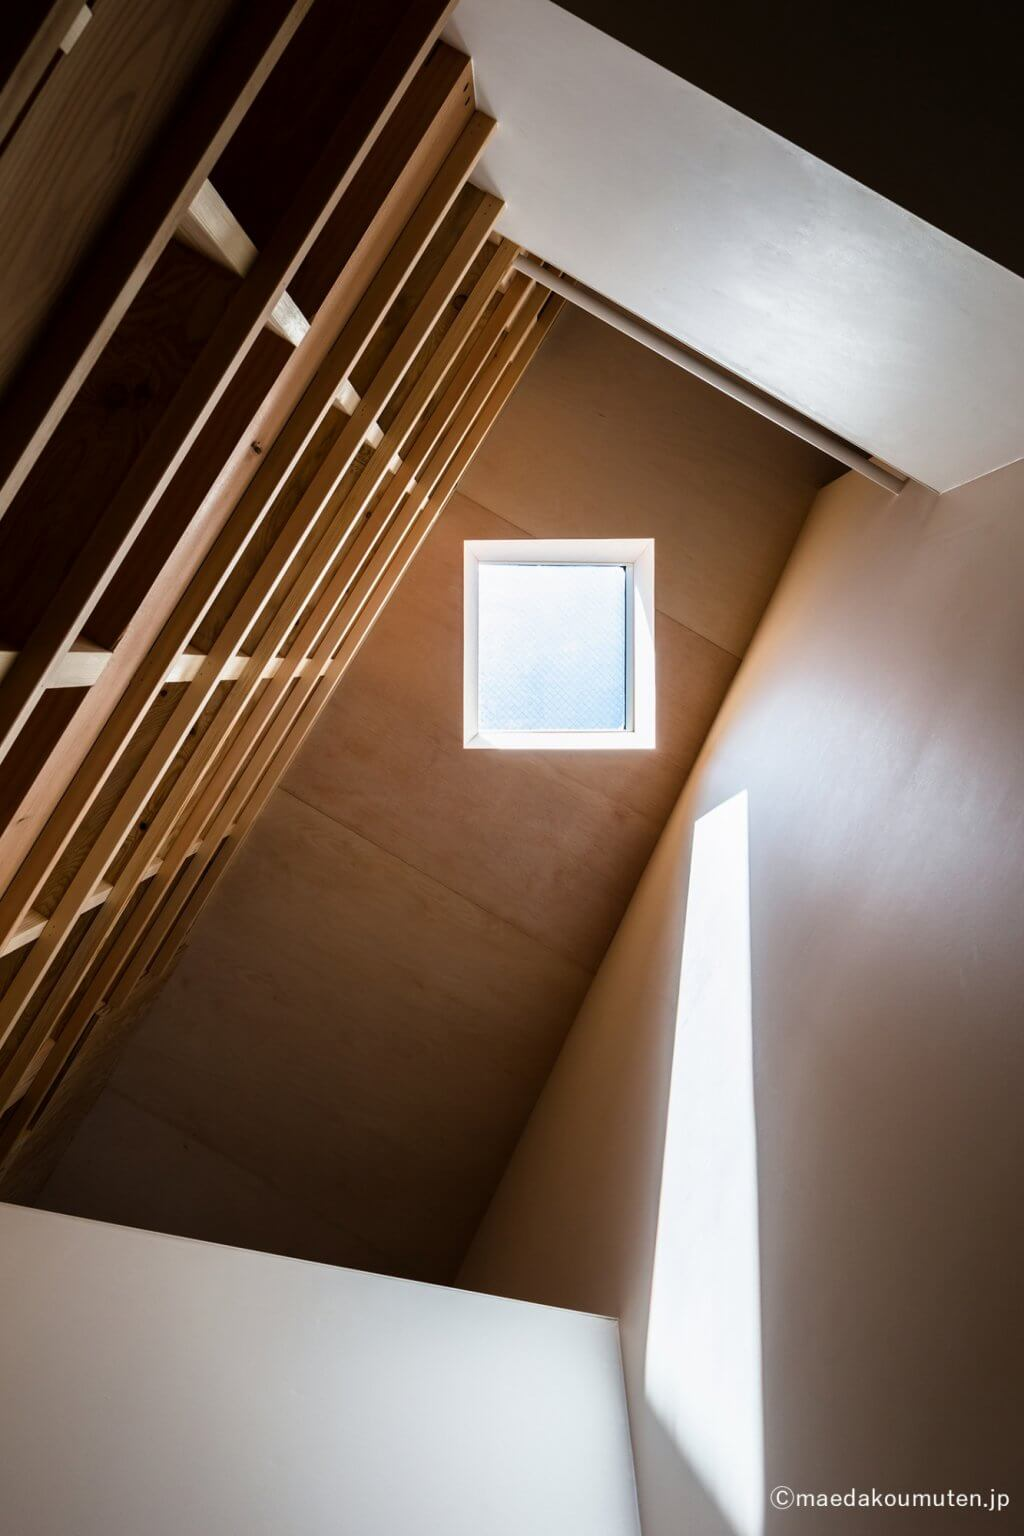 神奈川、工務店、注文住宅、デザイン住宅、建築家、亀井野の家、06